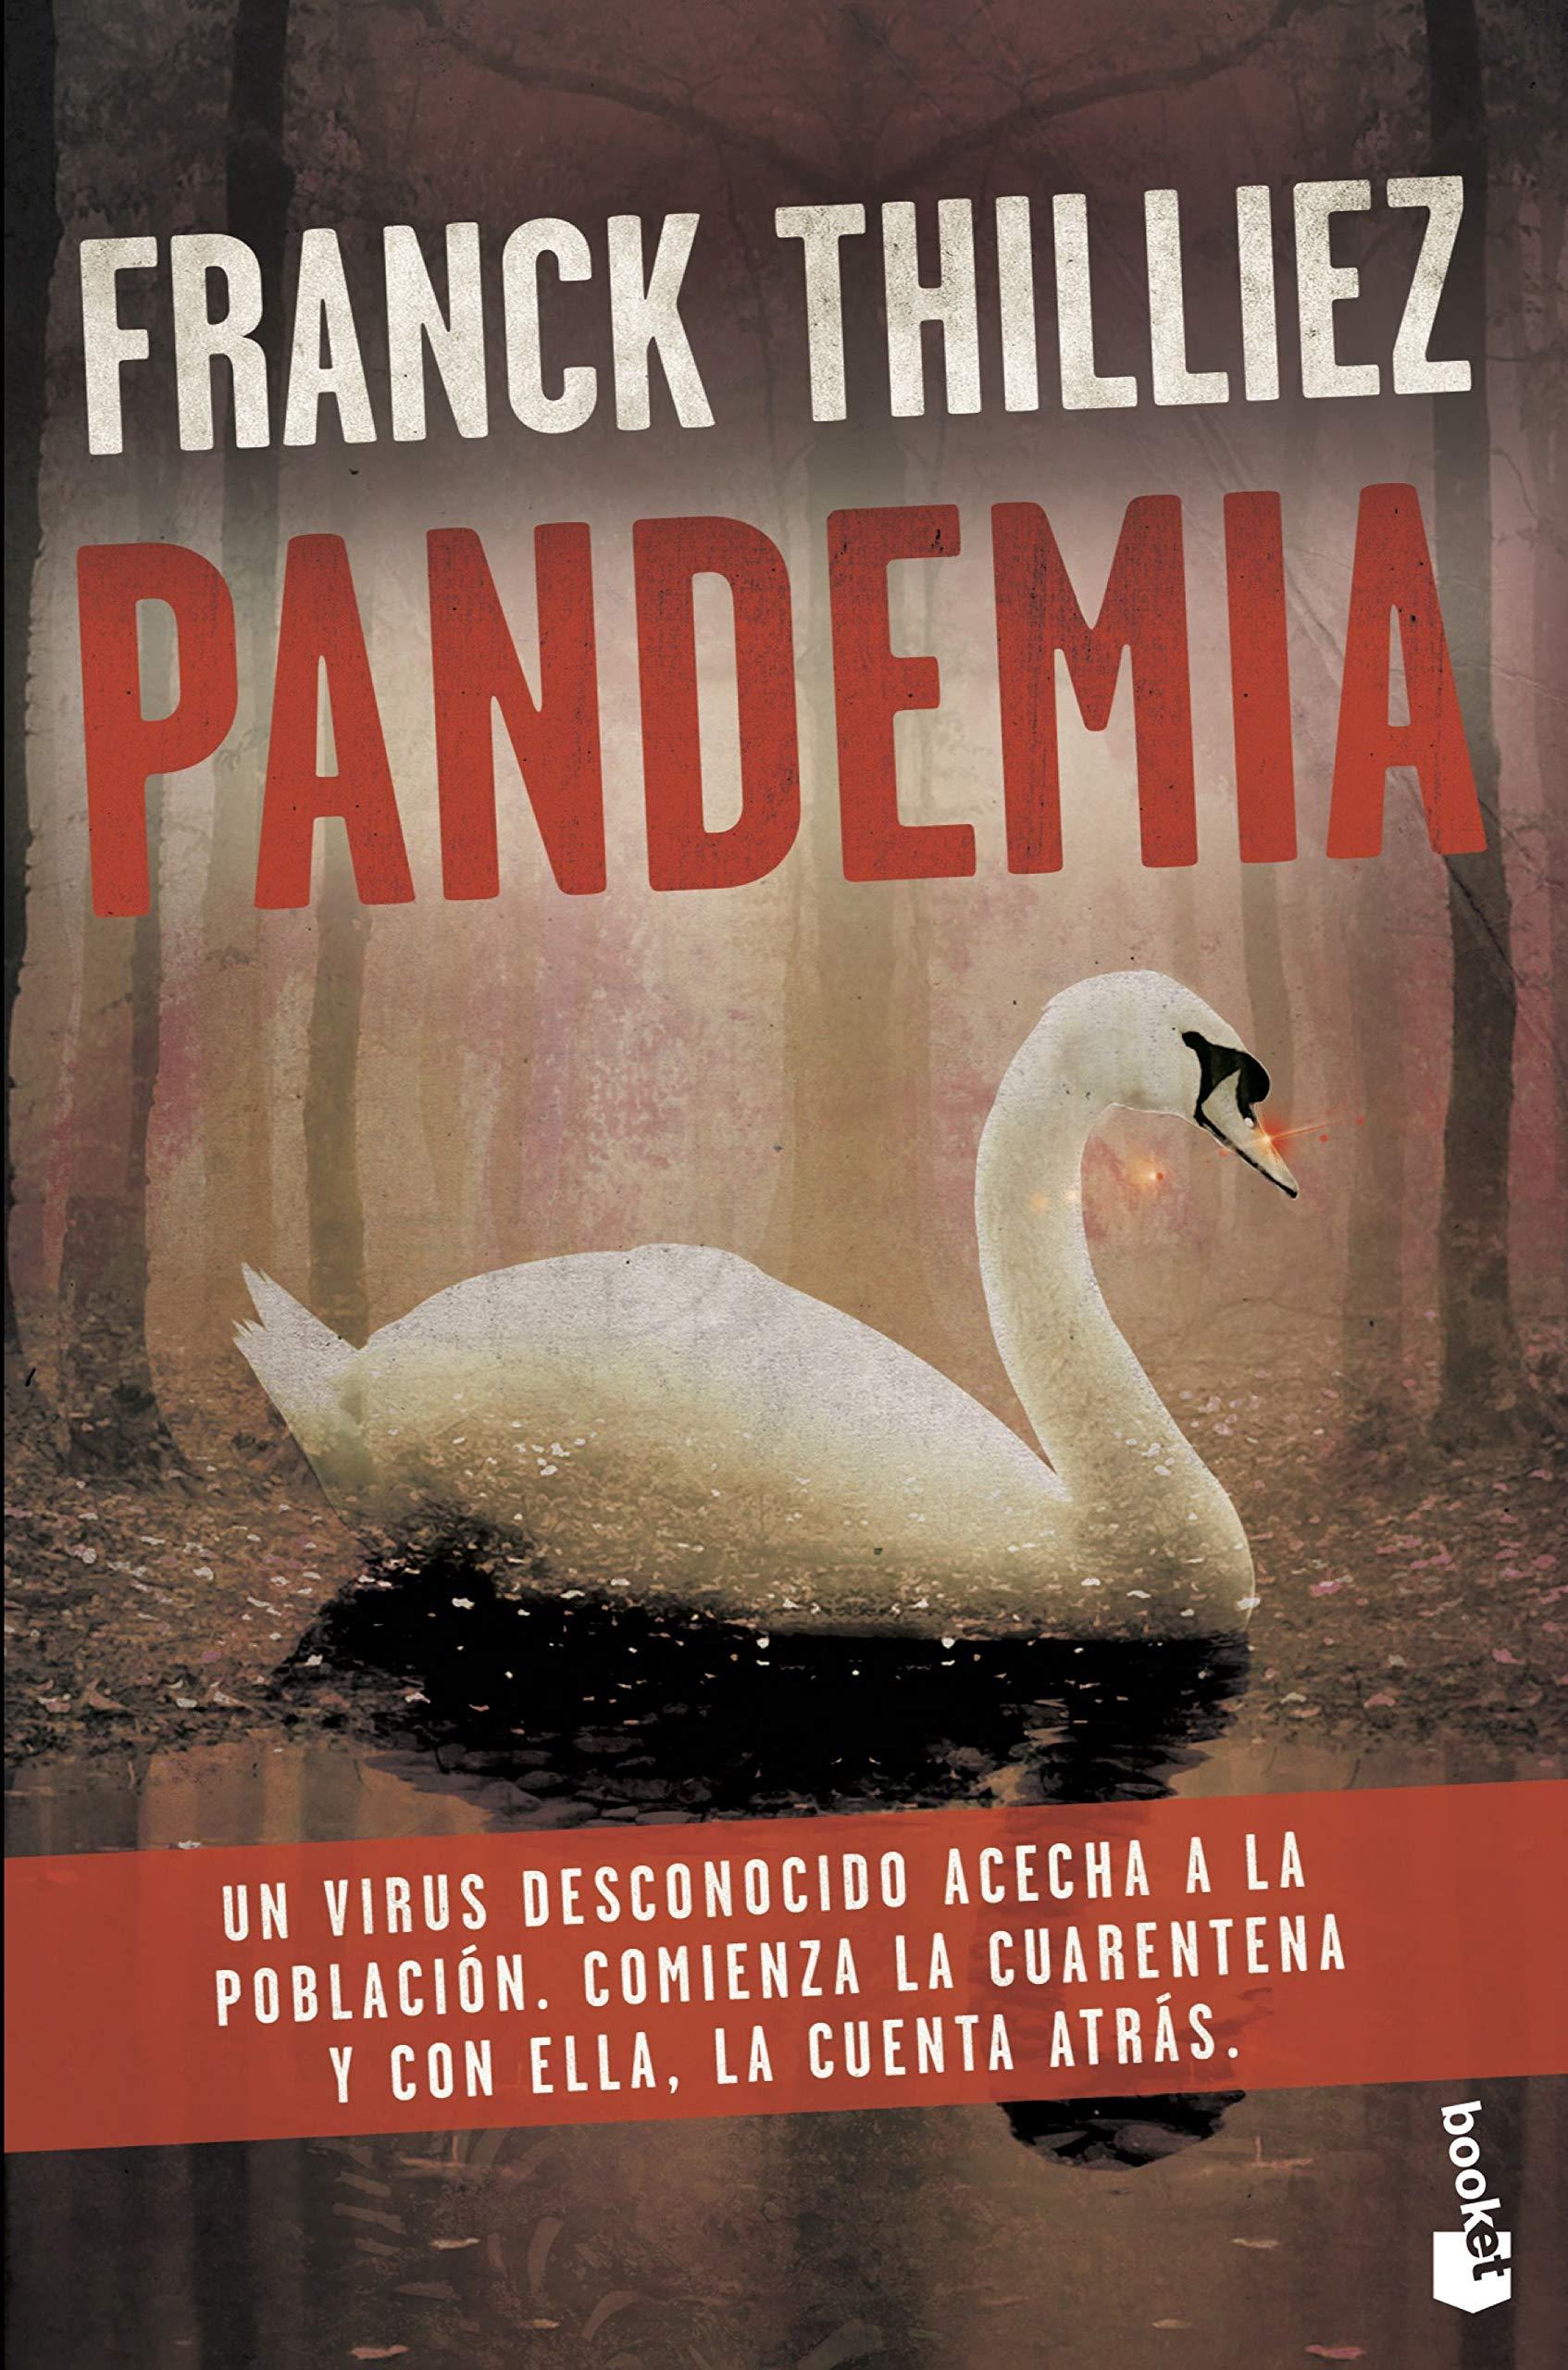 Pandemia (Crimen y Misterio): Amazon.es: Thilliez, Franck, Riambau Möller, Joan: Libros